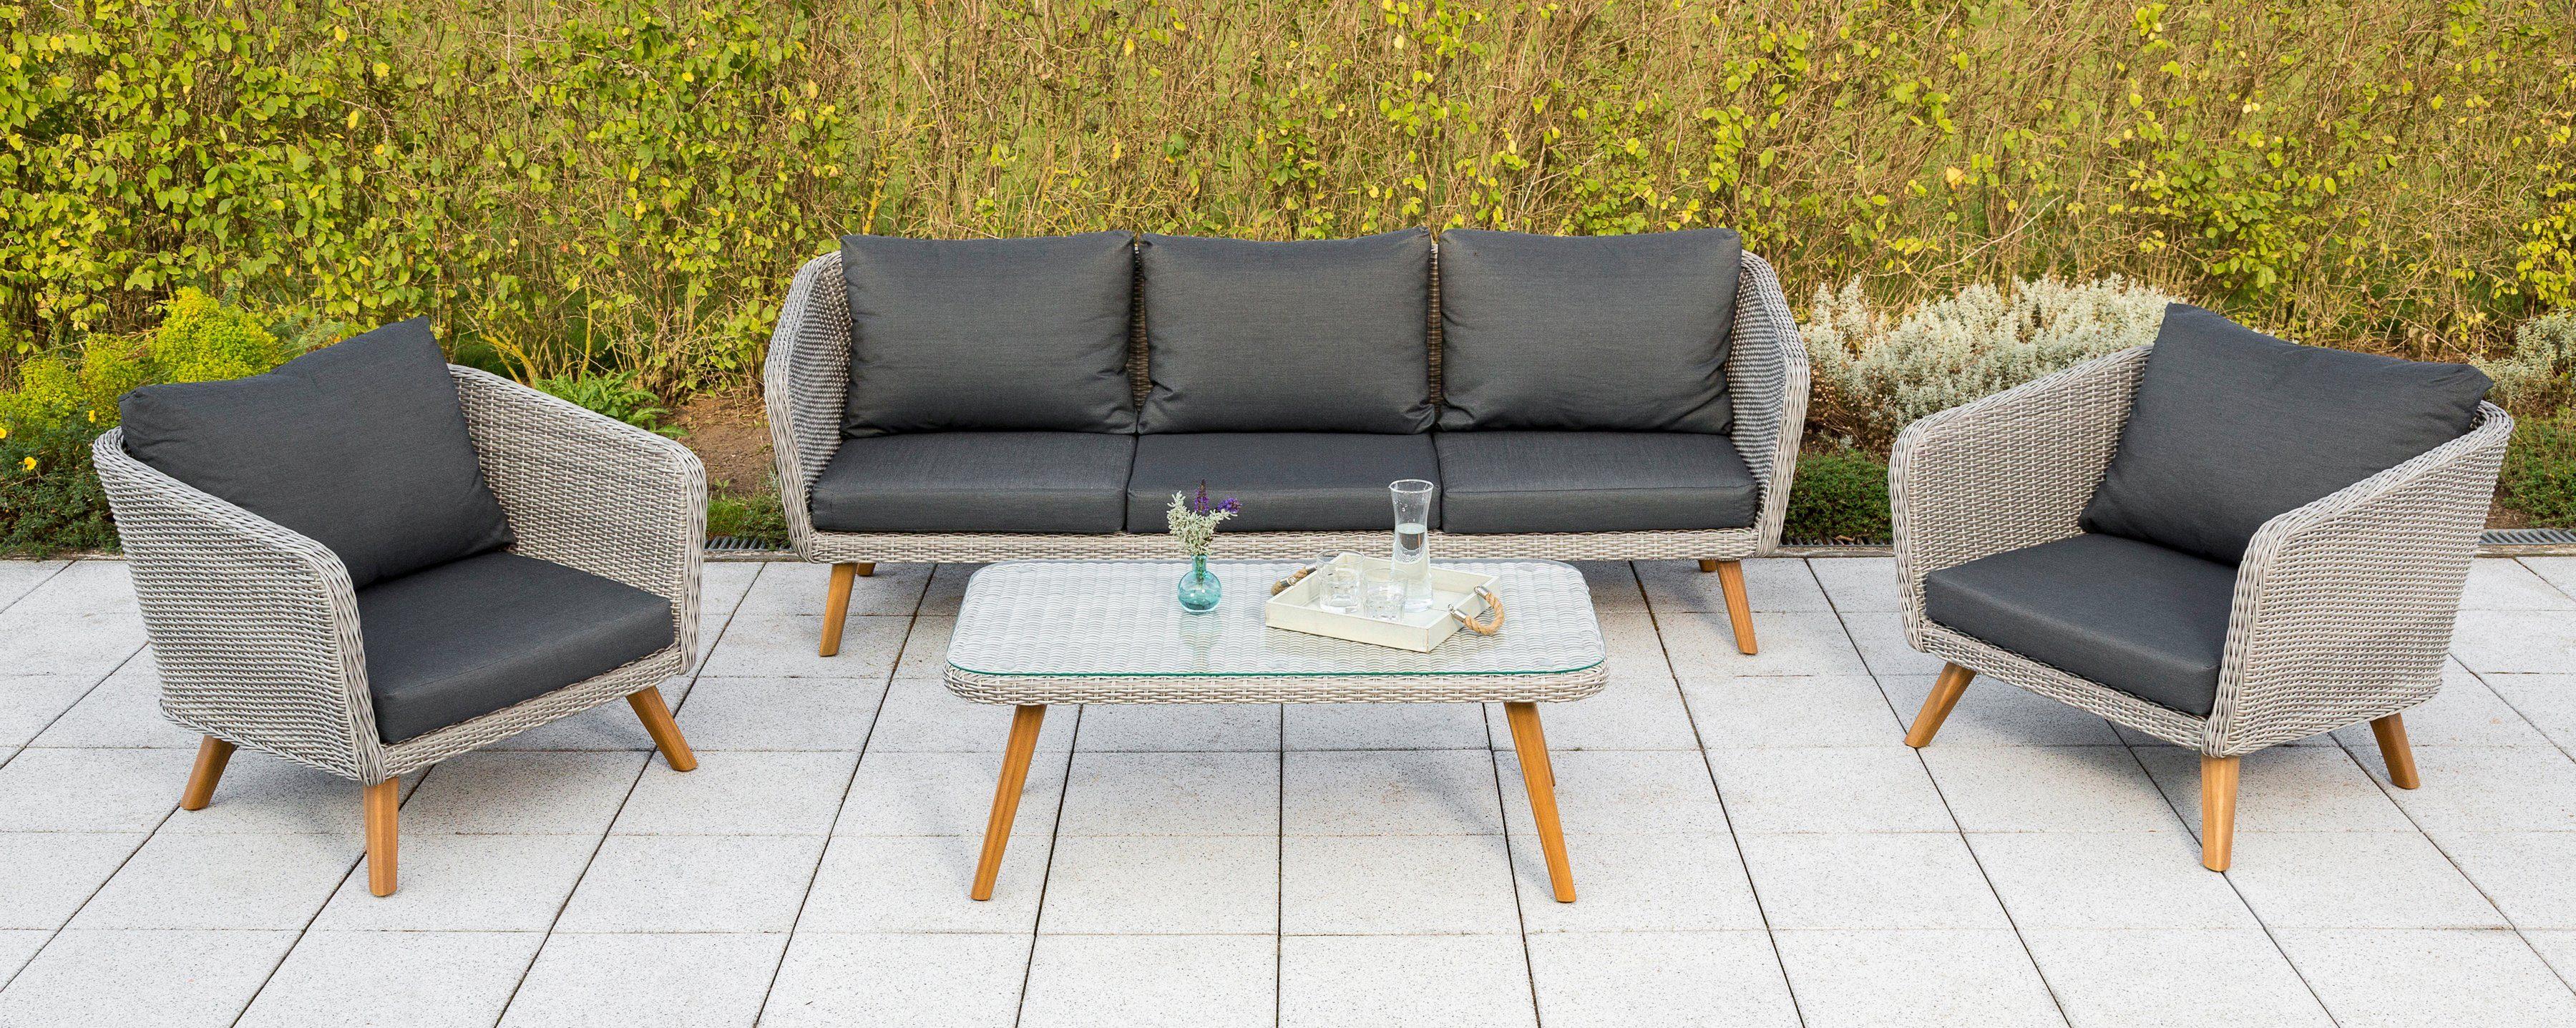 MERXX Loungeset »Toscanella«, 14-tlg., 2 Sessel, 3er-Bank, Tisch 110x60 cm, Polyrattan